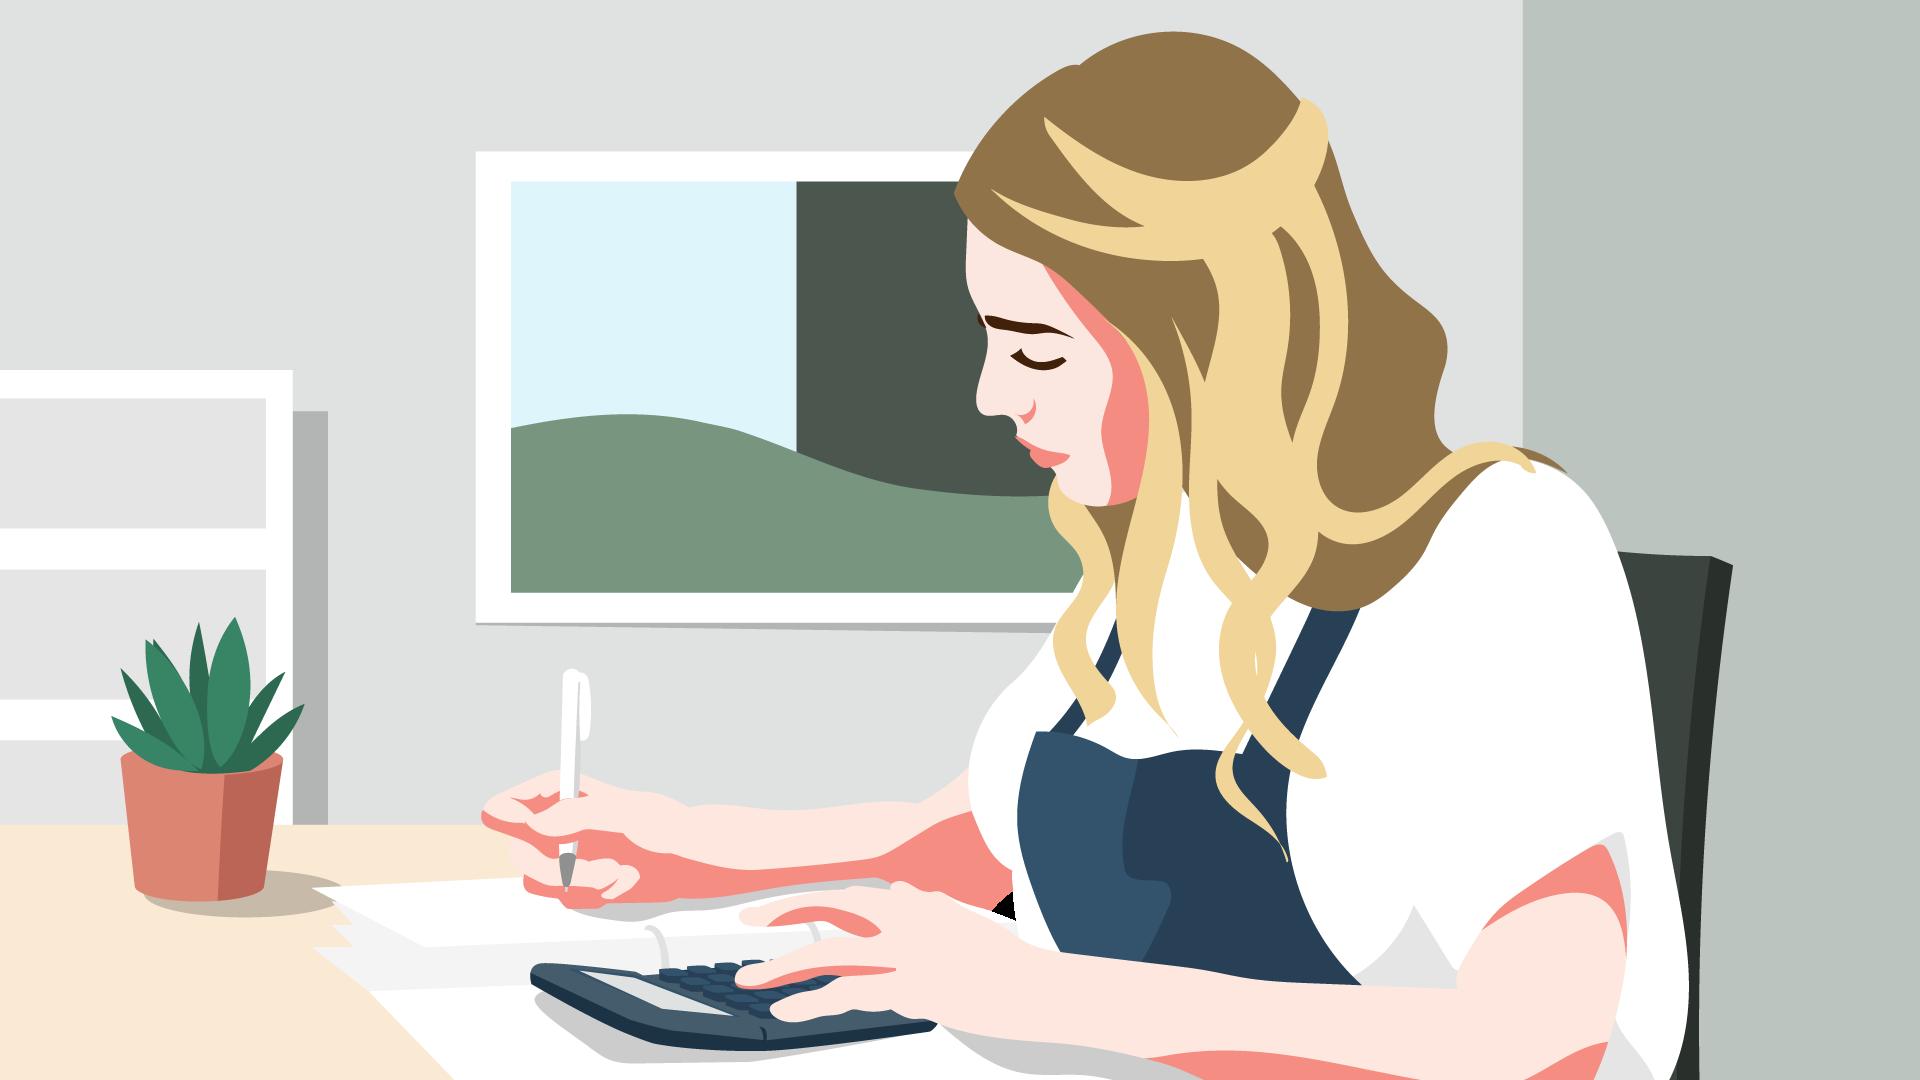 freelancers-in-need-diy-or-professional-help